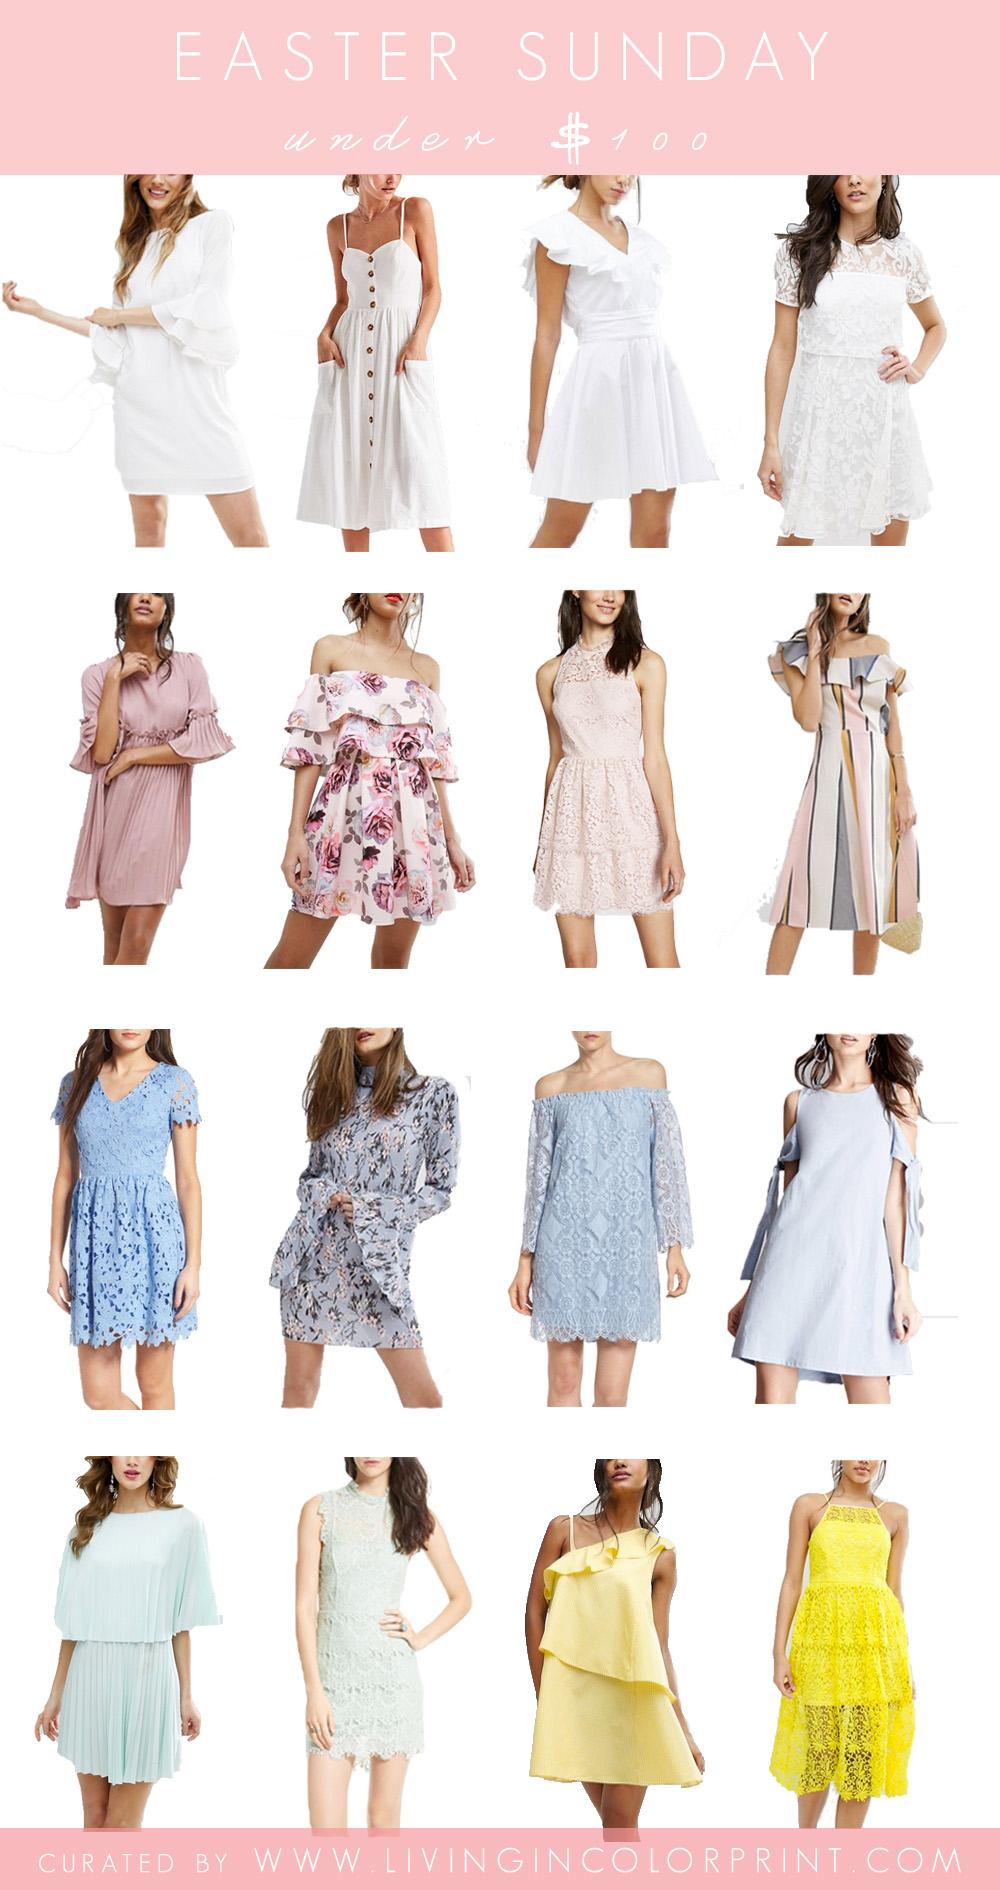 Easter Sunday Dresses under $100